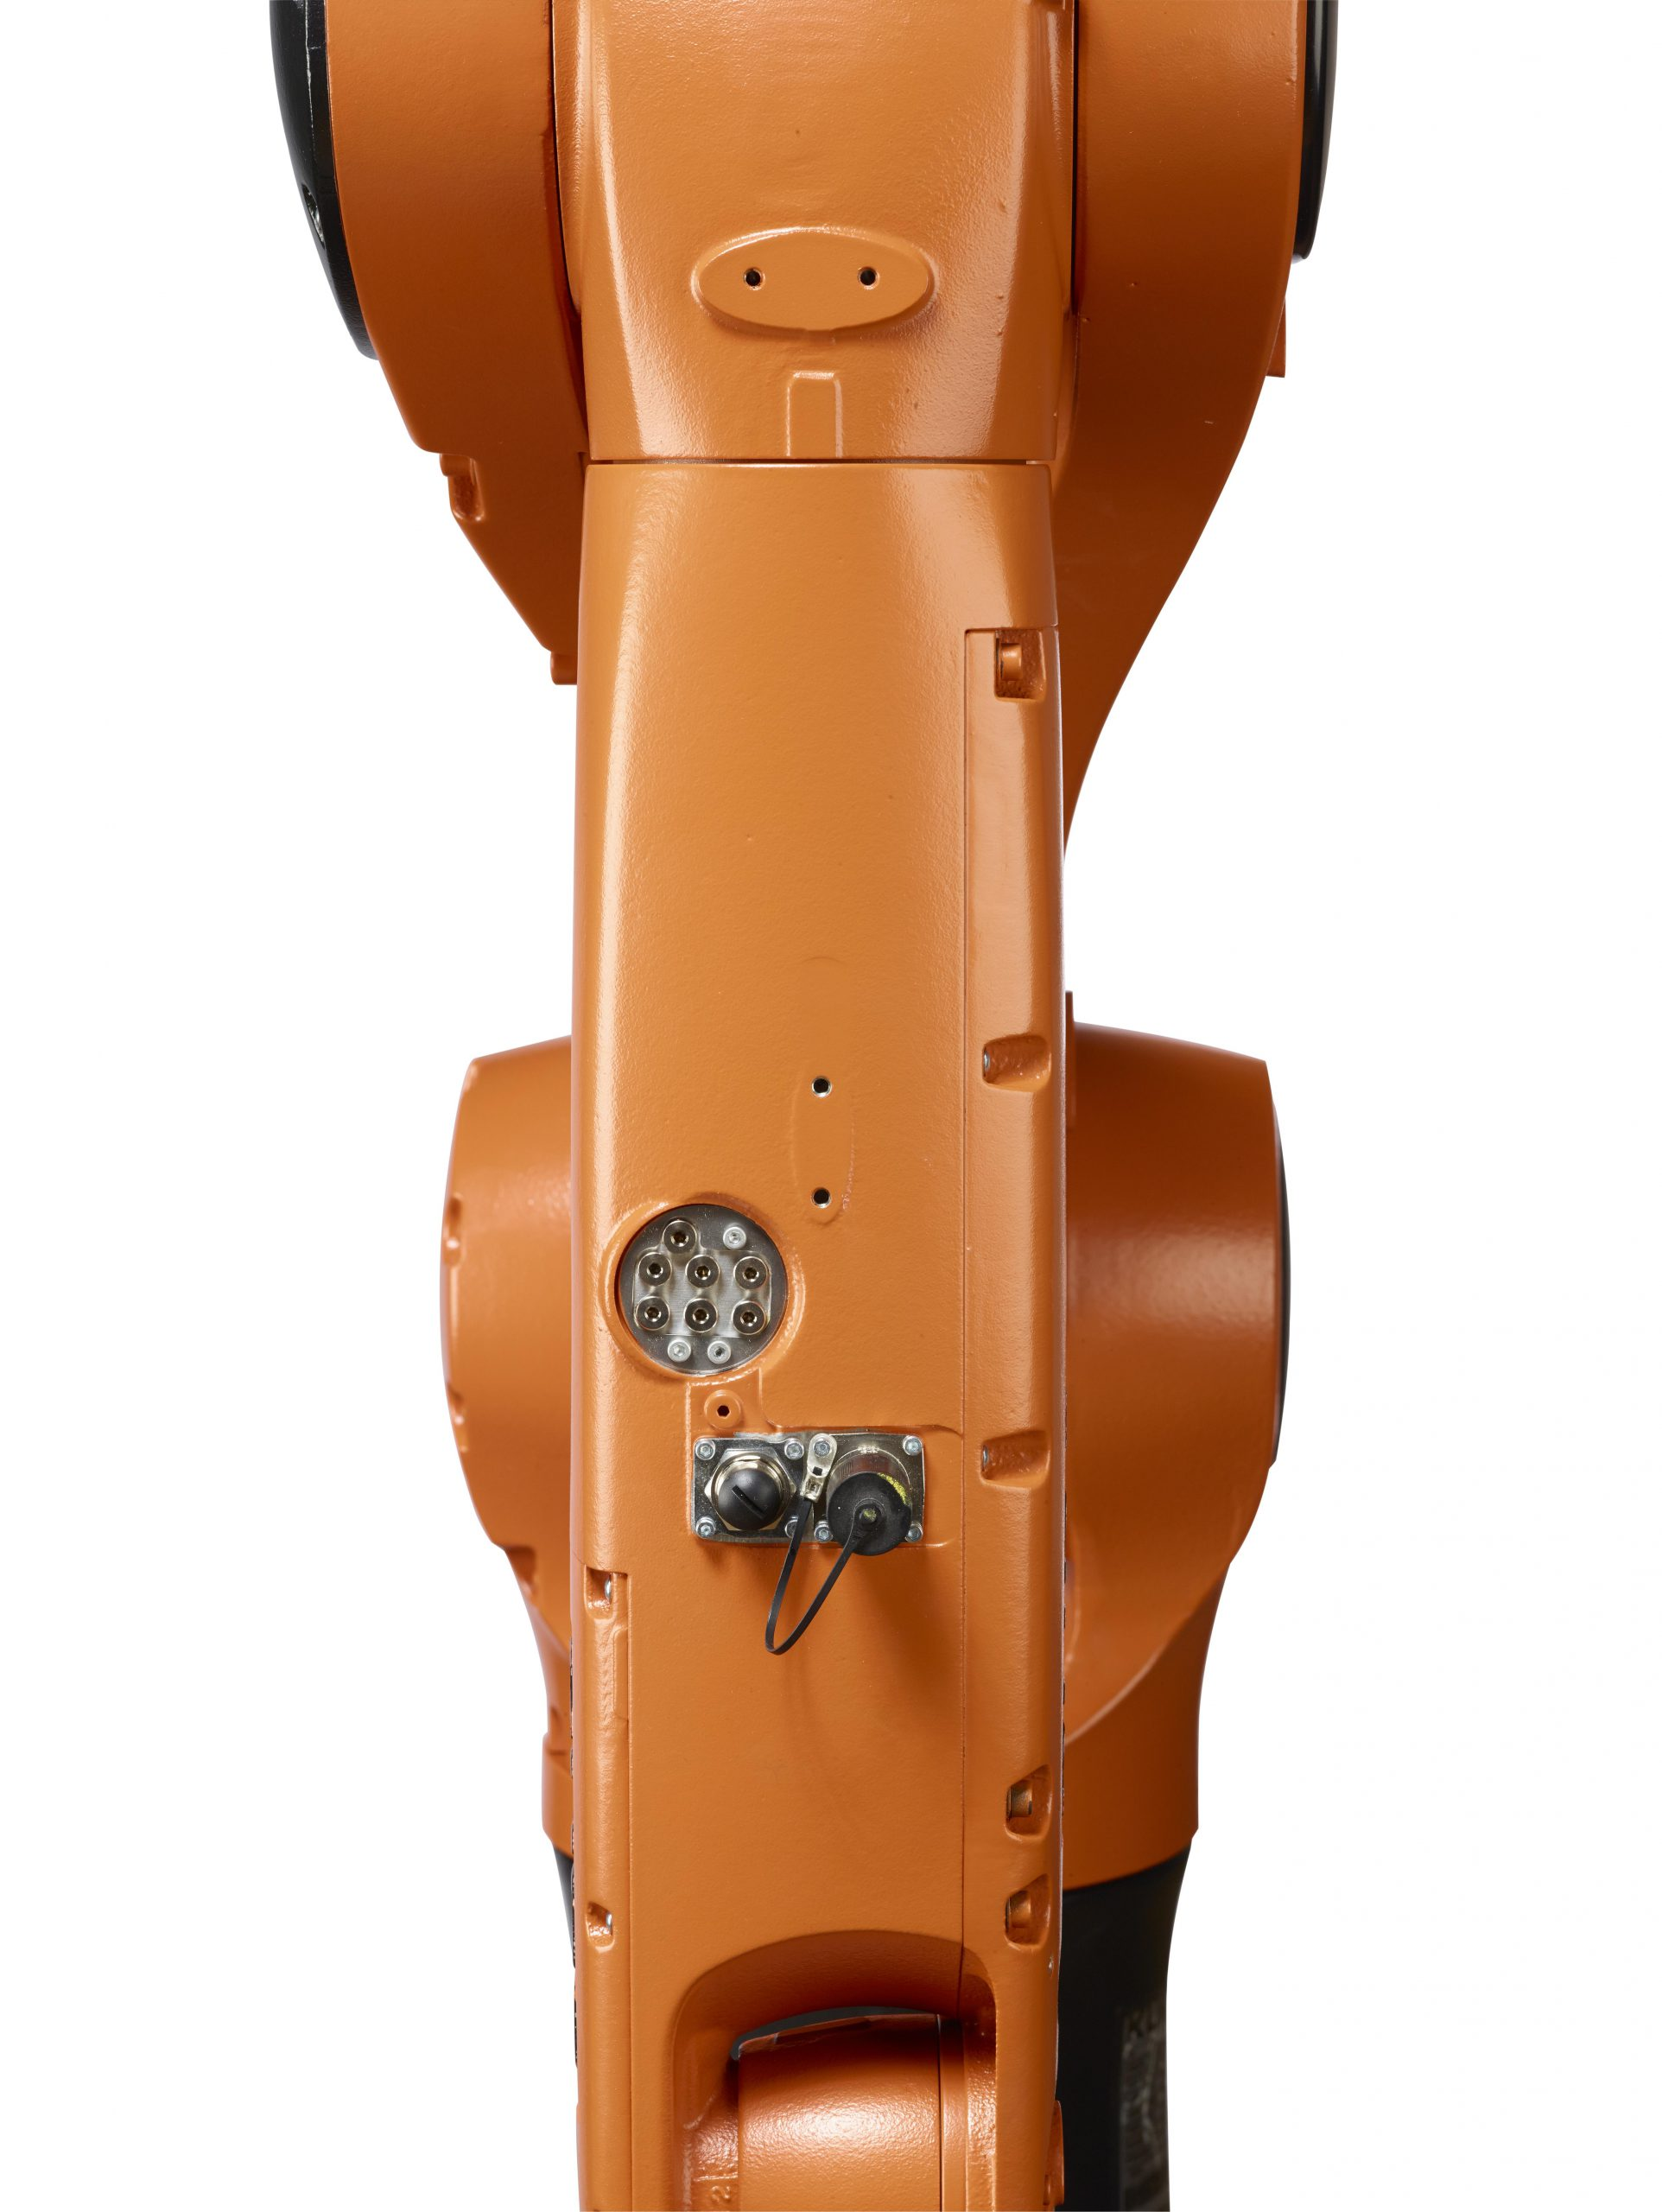 KUKA KR 6 R900 sixx (KR AGILUS)-8